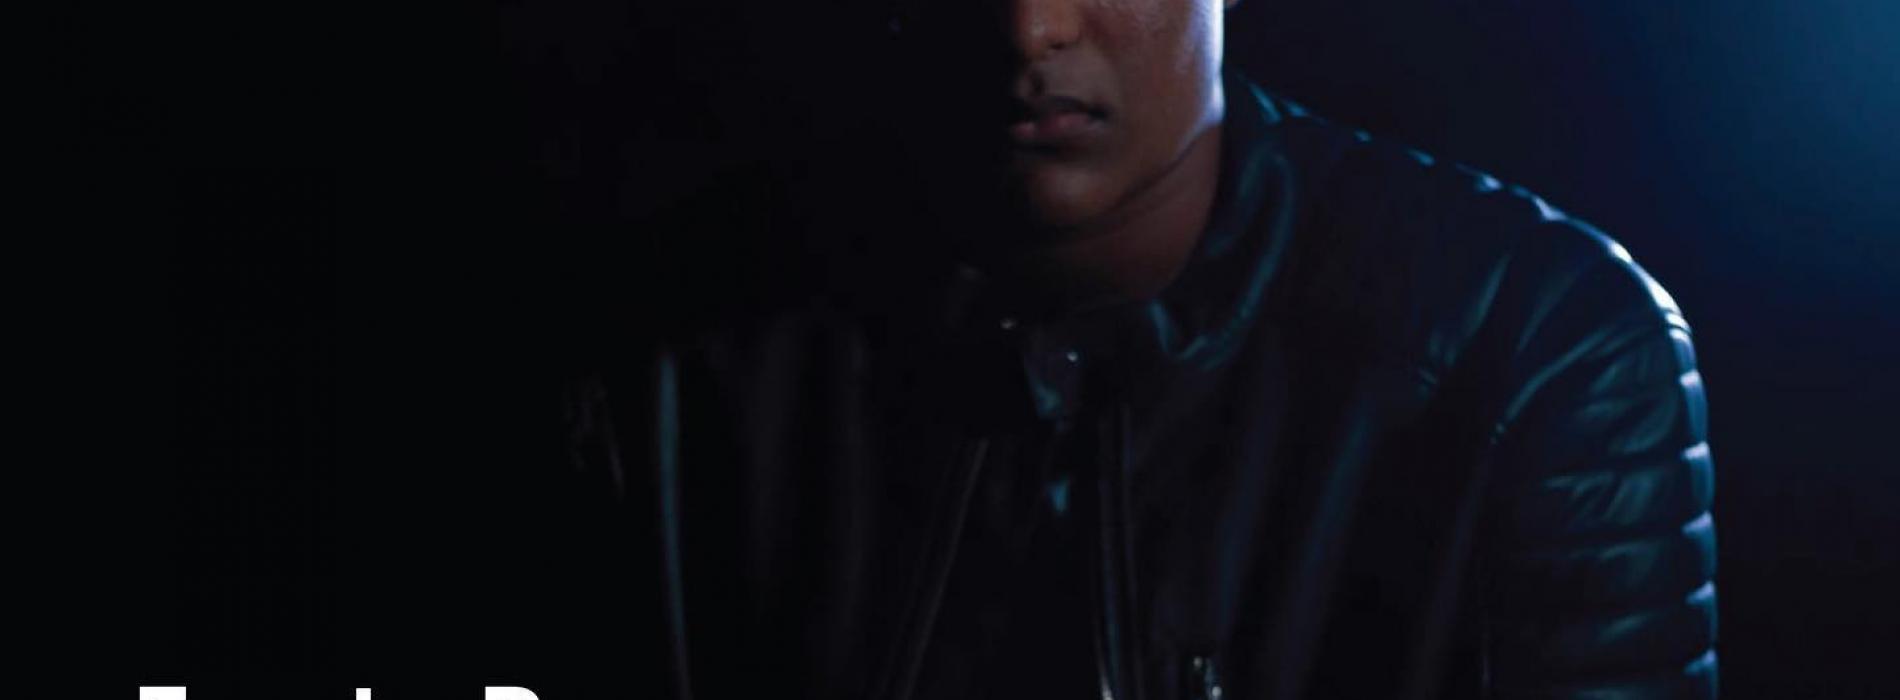 New Music : Tristen JG – Empty Room (Official Video)